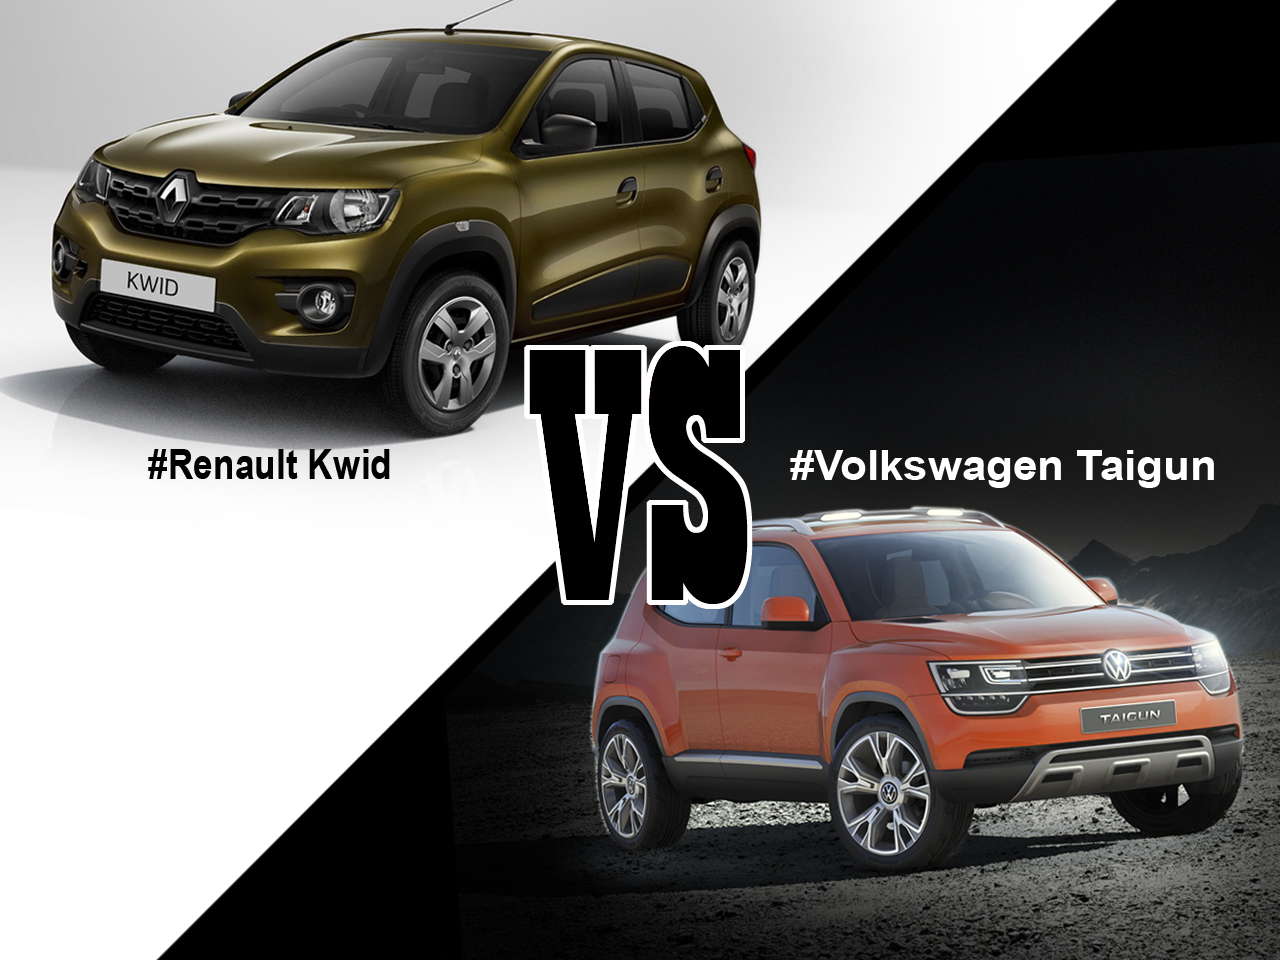 Renault Kwid Vs Volkswagen Taigun Le Match Des Quot Suv